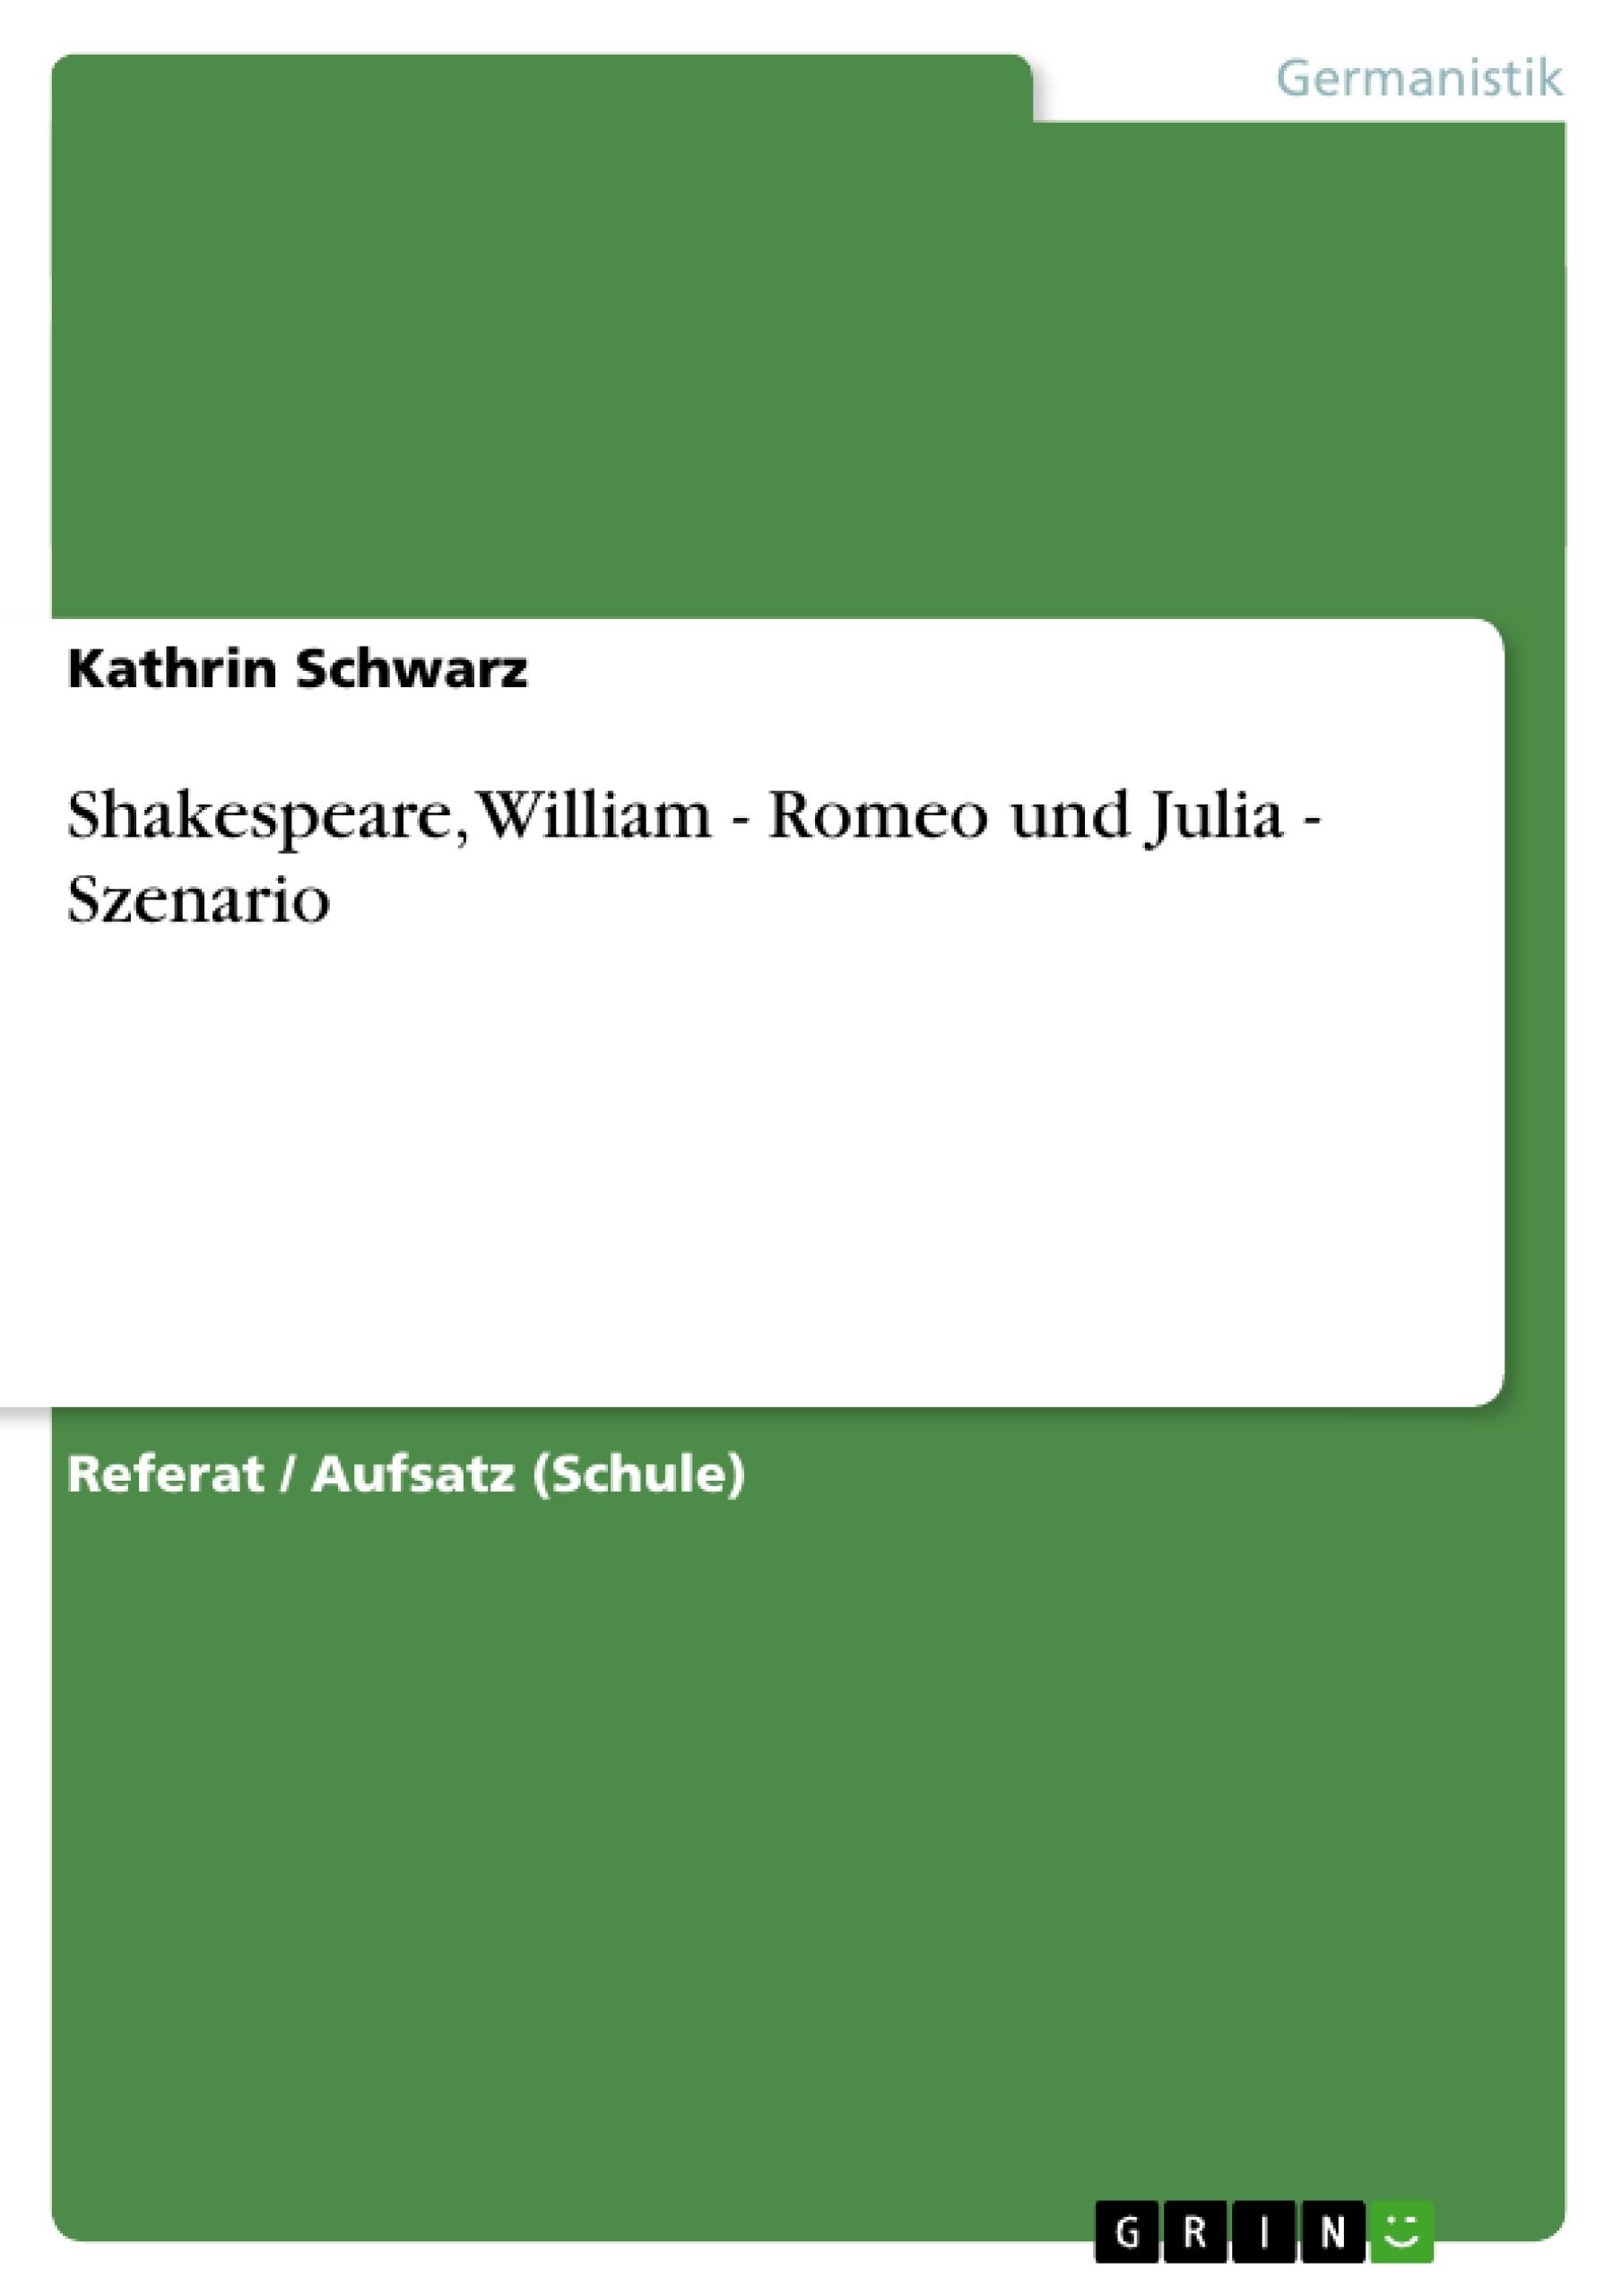 Titel: Shakespeare, William - Romeo und Julia - Szenario